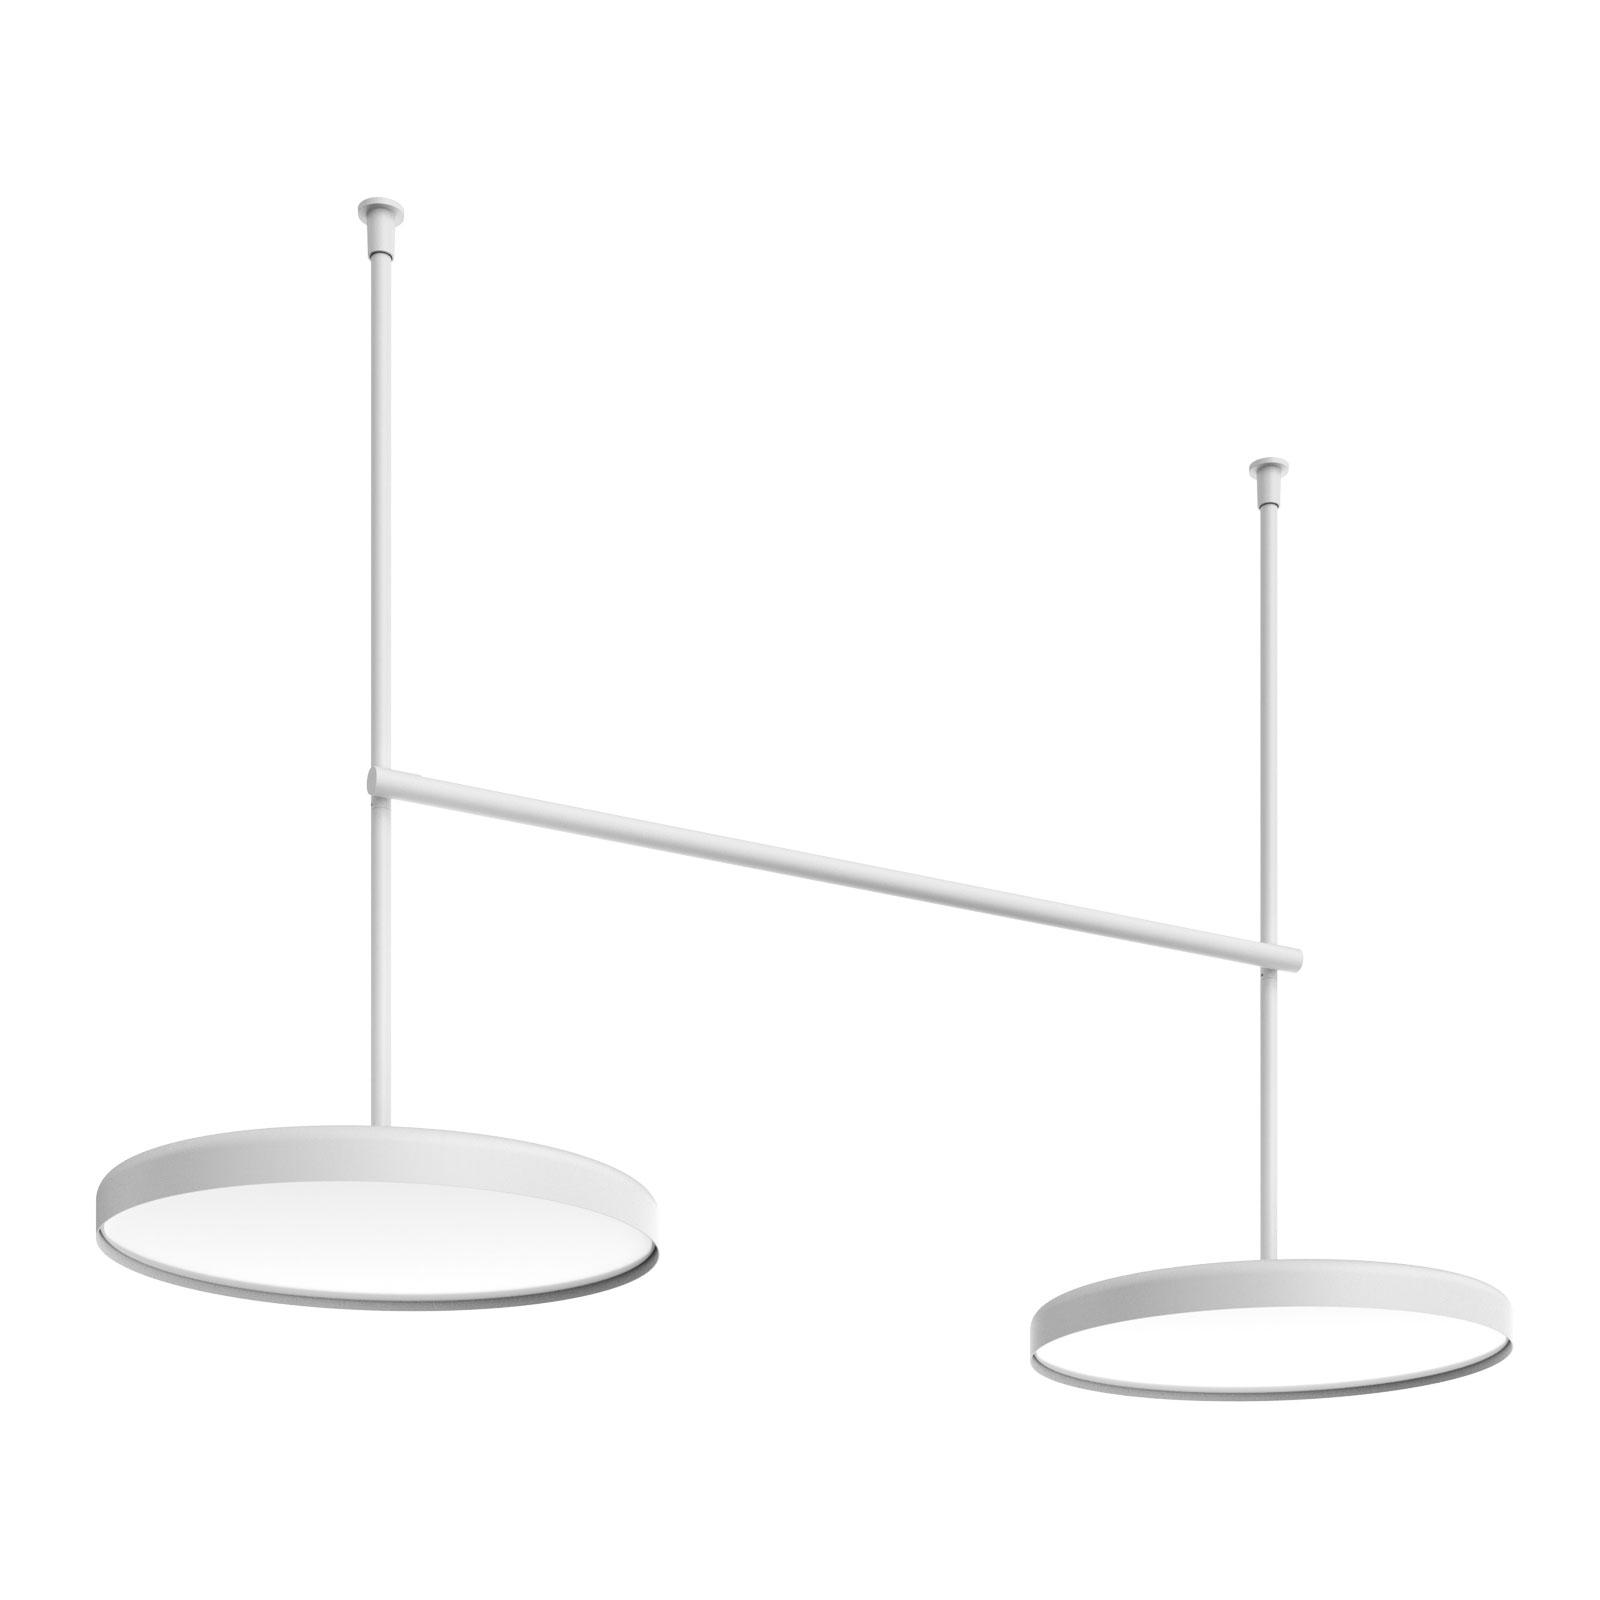 FLOS Infra-Structure C4 -LED-kattovalo, valkoinen